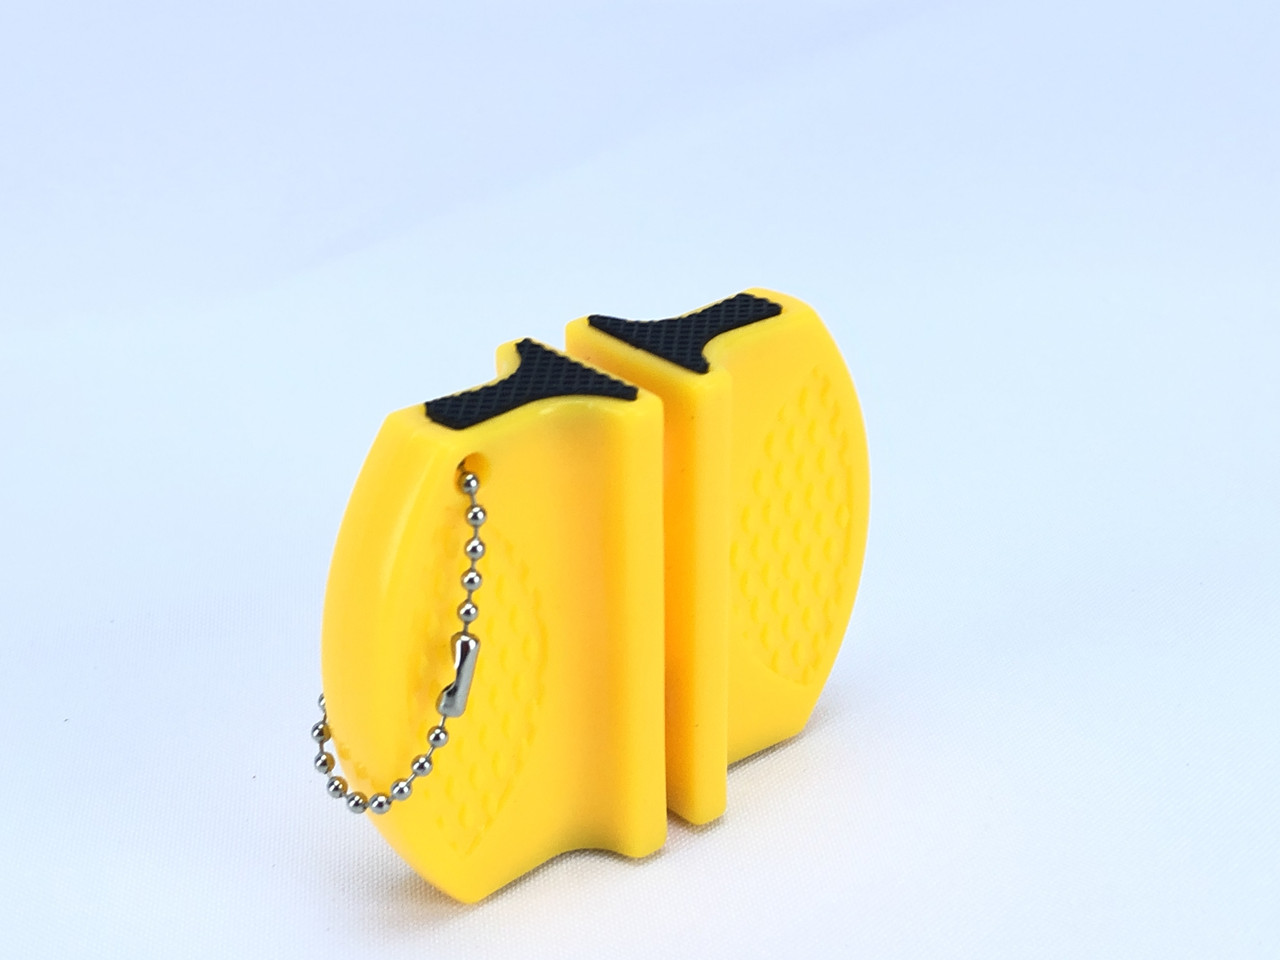 Точилка для кухонных ножей, желтая